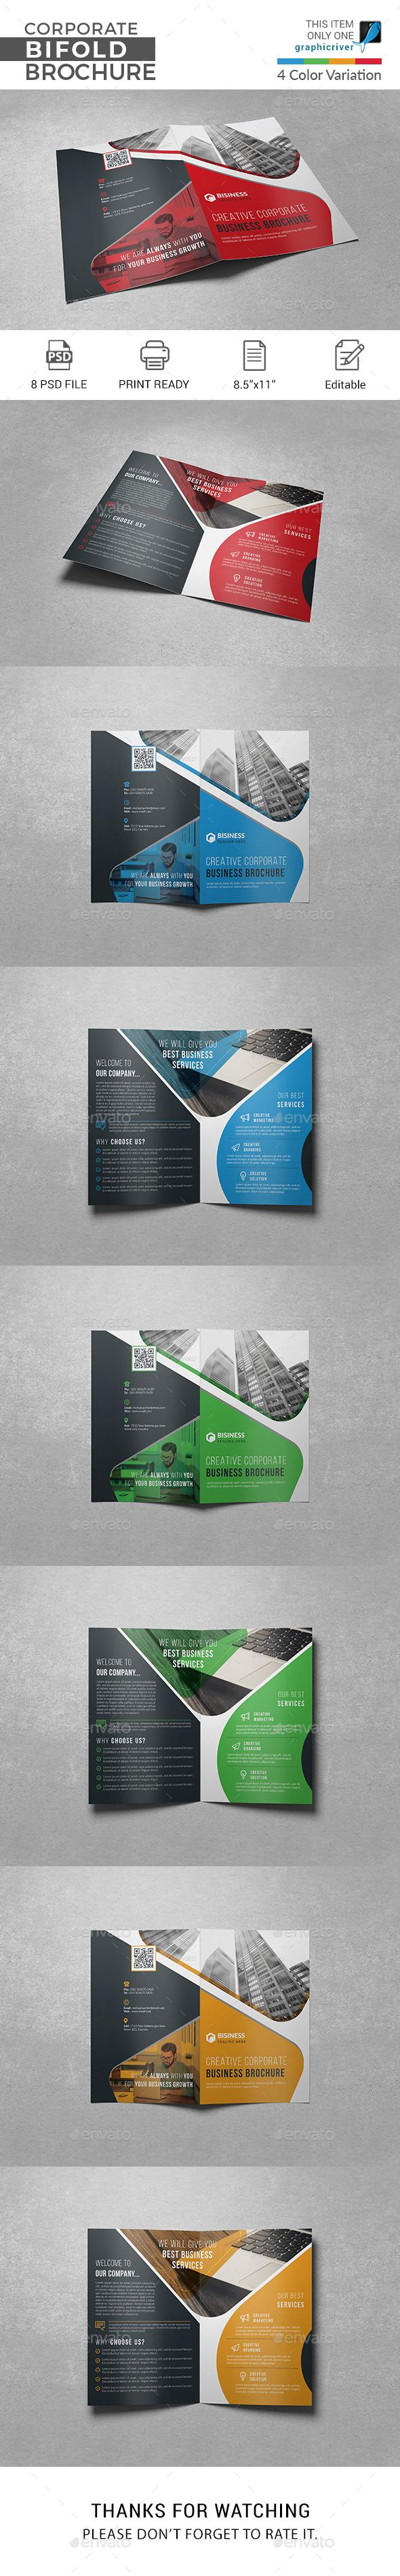 Bi Fold Brochure Template Psd Easy Customizable And Editable Print Ready Format